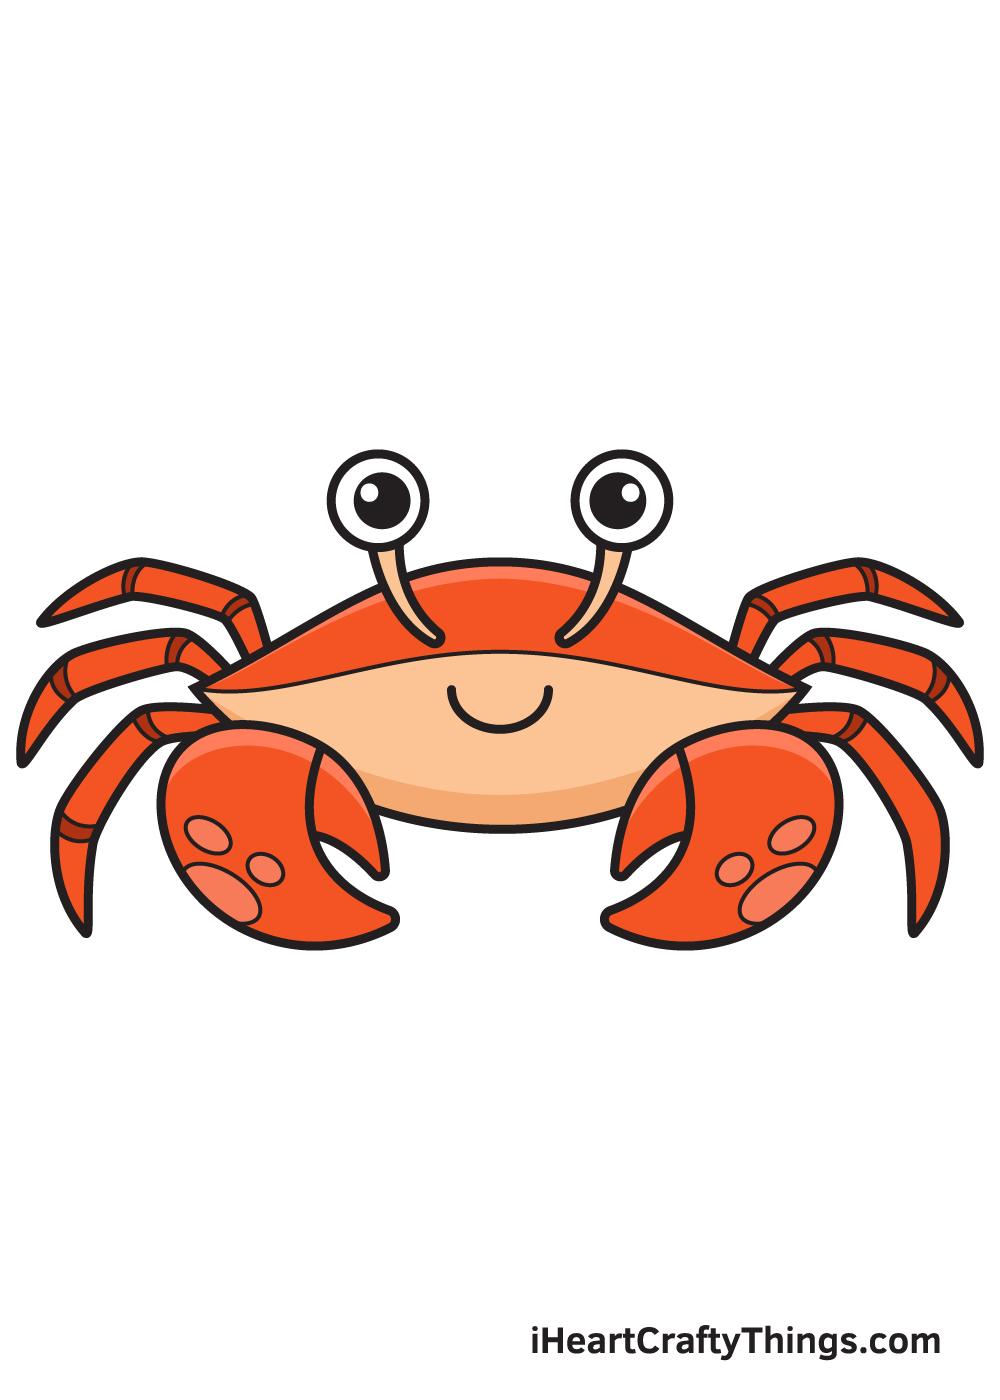 Crab Drawing – 9 Steps